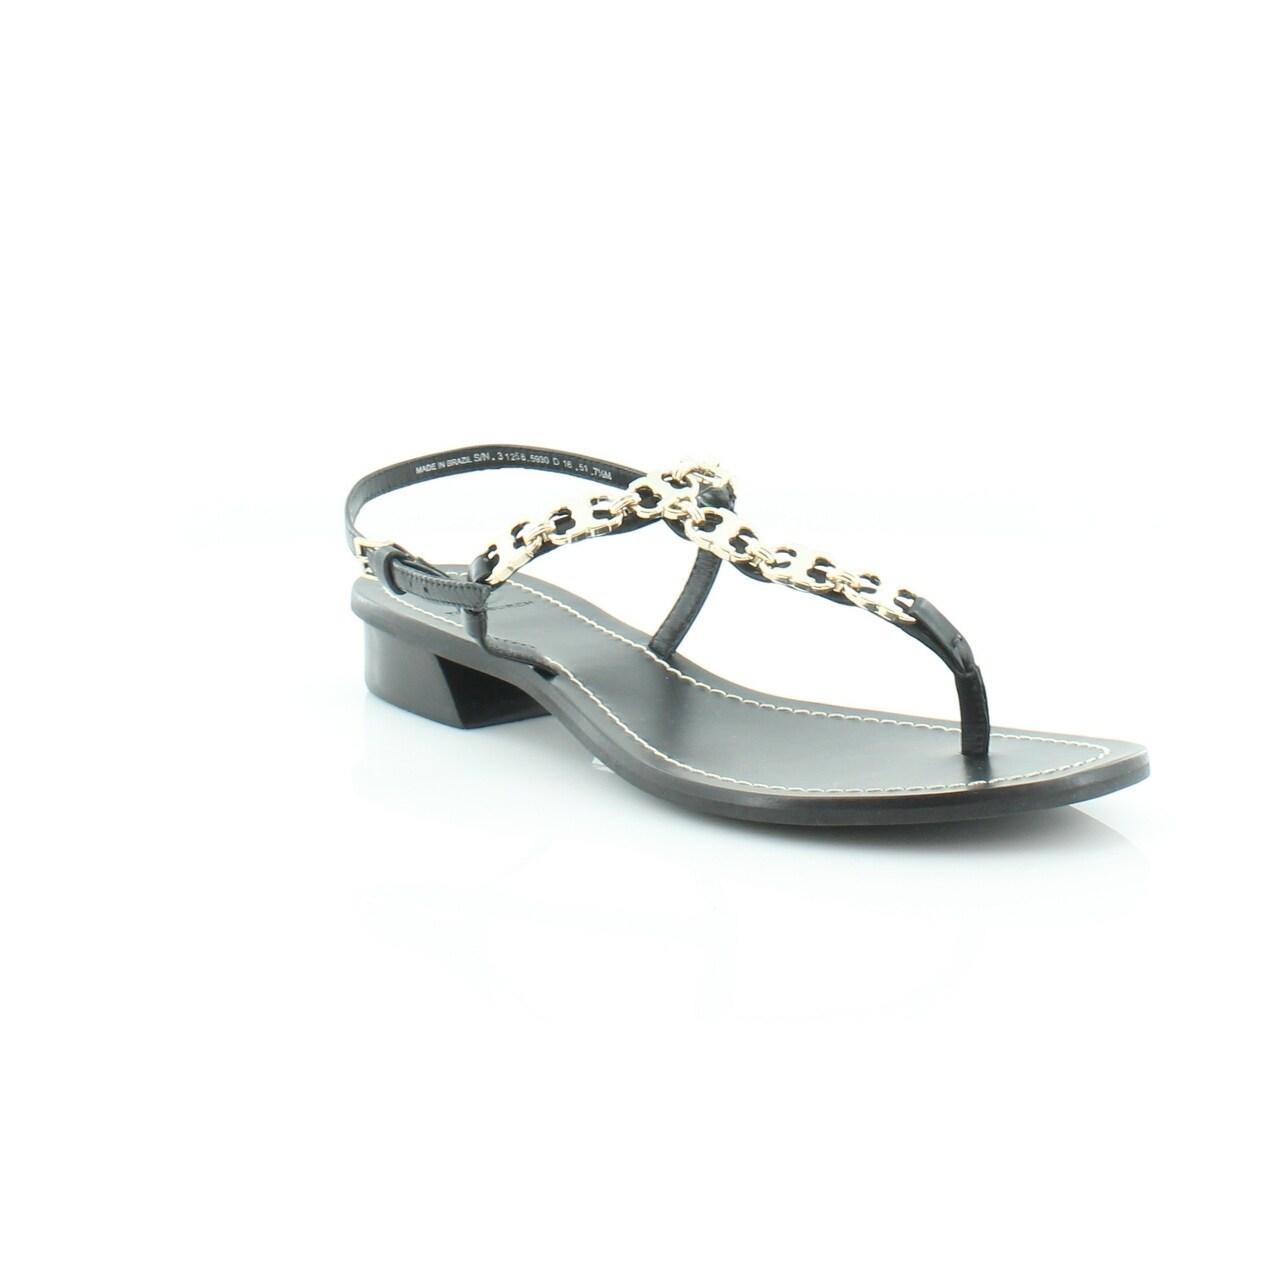 2461c45a1b7a Shop Tory Burch Gemini Link T Strap Women s Sandals   Flip Flops ...